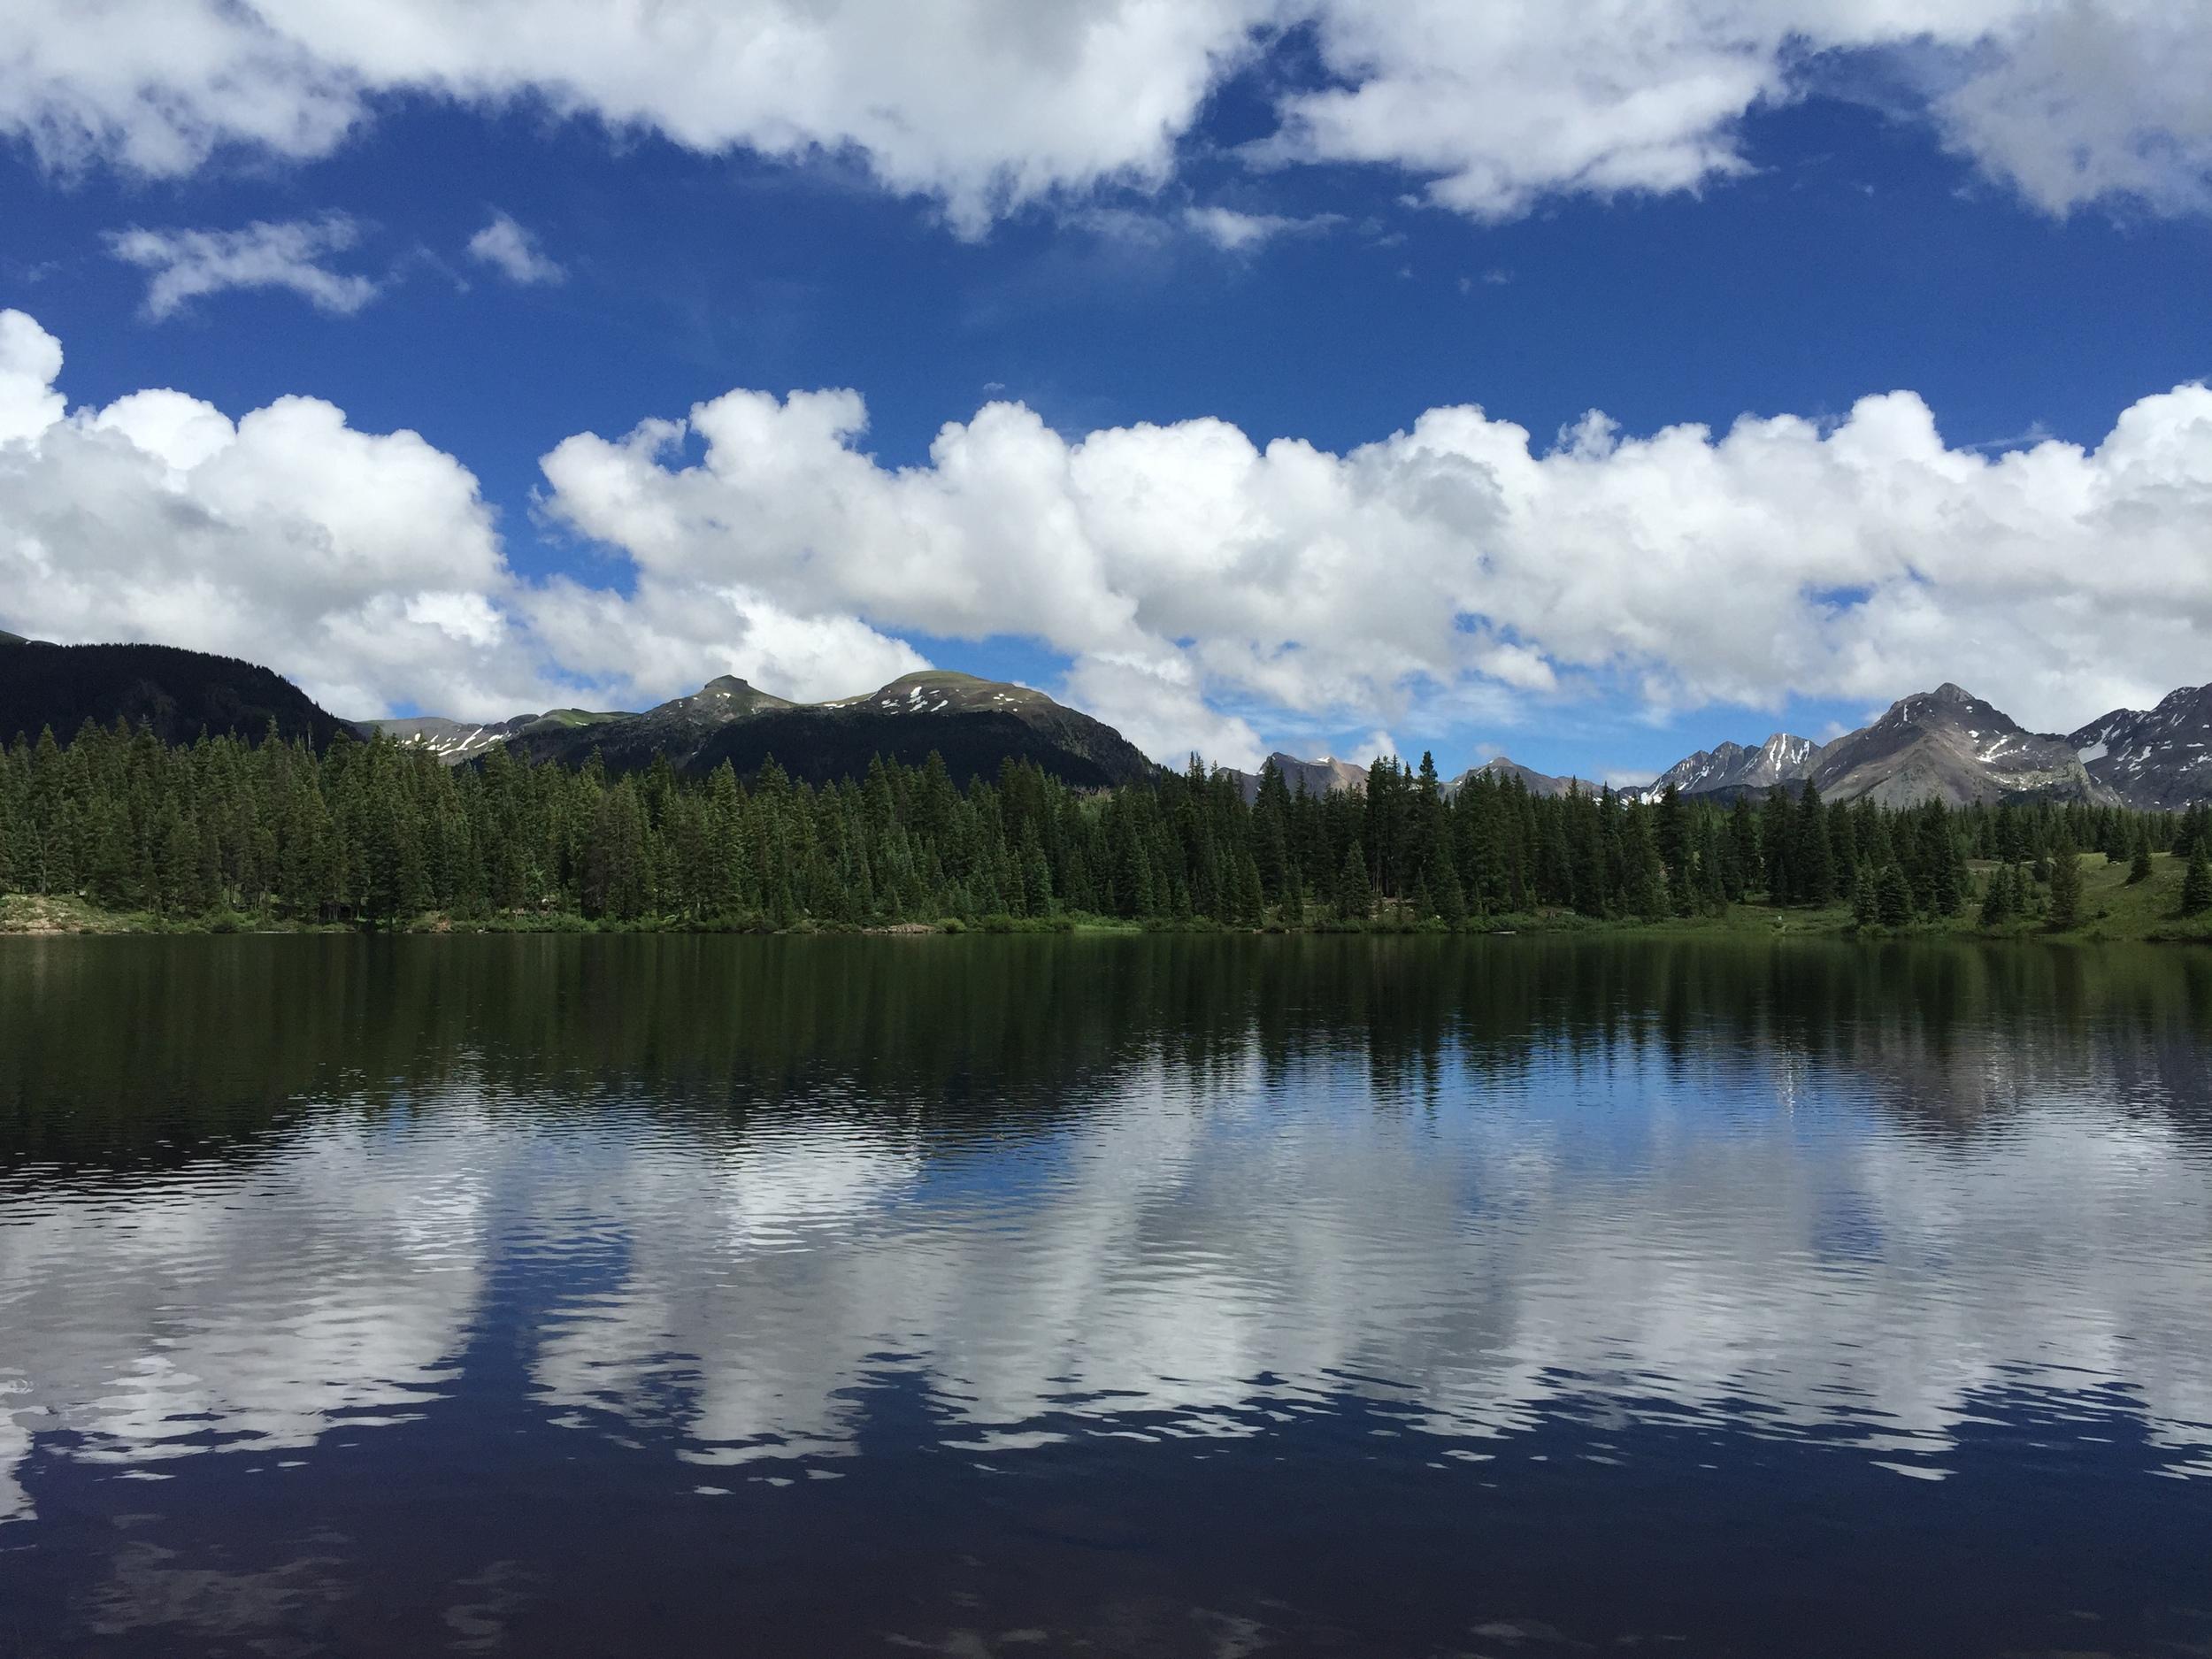 Nicoles Lake Reflections